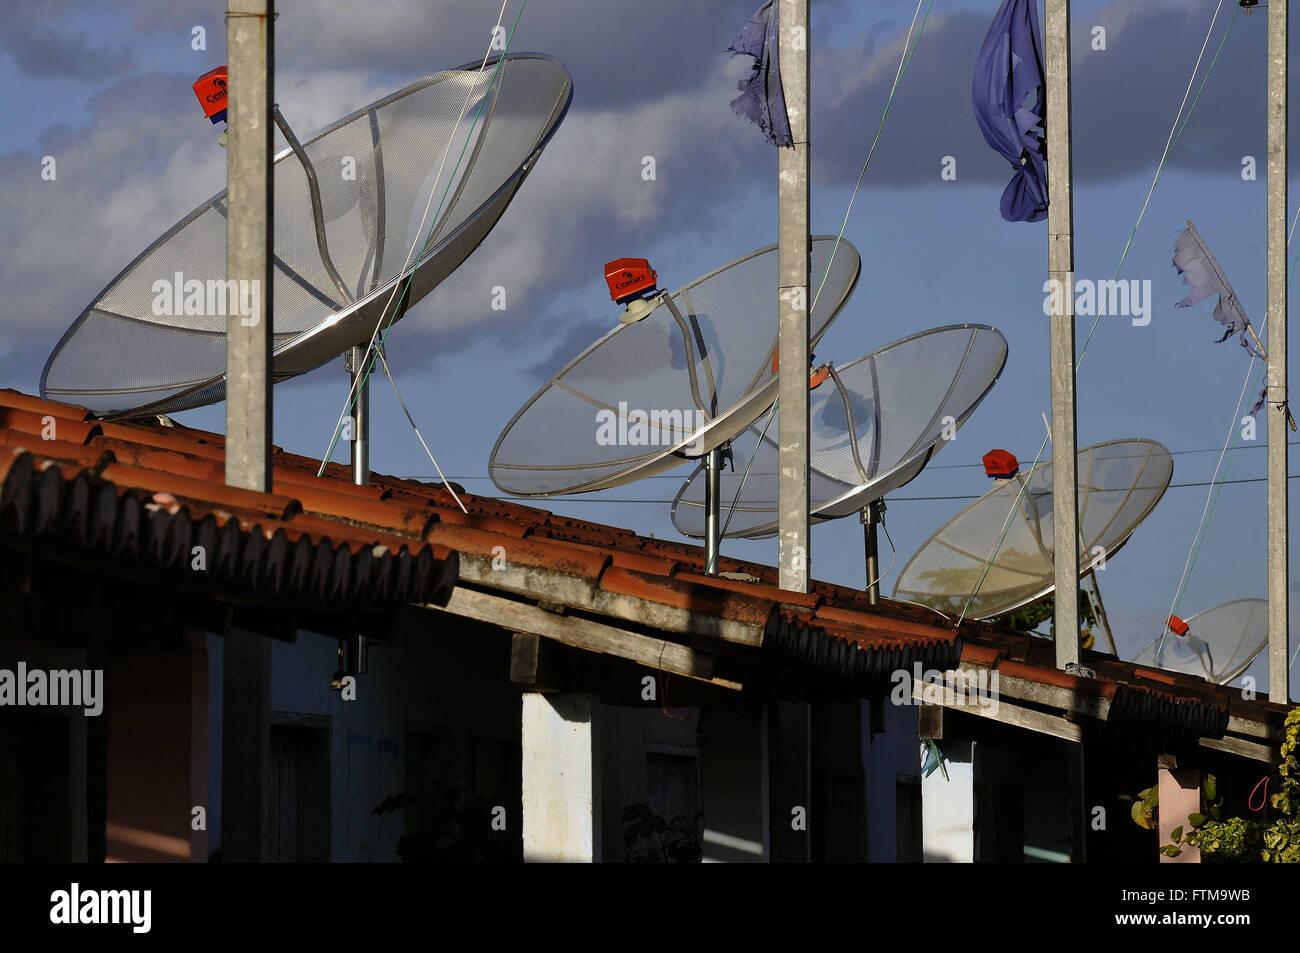 Parabolantennen an den Häusern Gehäuse installiert Stockbild